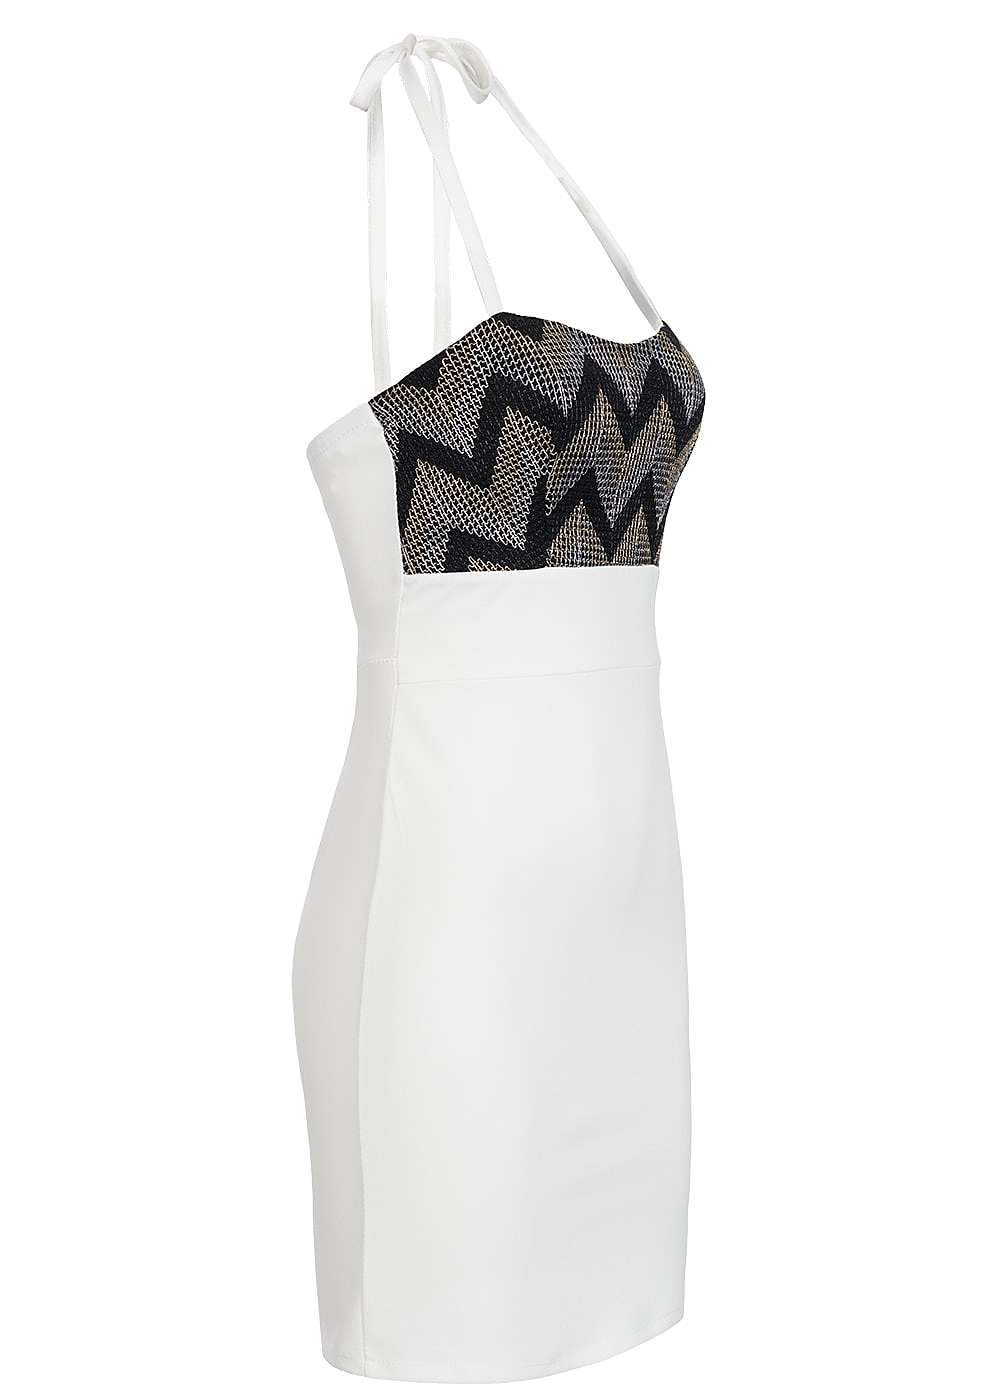 styleboom fashion damen mini neckholder kleid brustpads zipper glitter optik weiss 77onlineshop. Black Bedroom Furniture Sets. Home Design Ideas